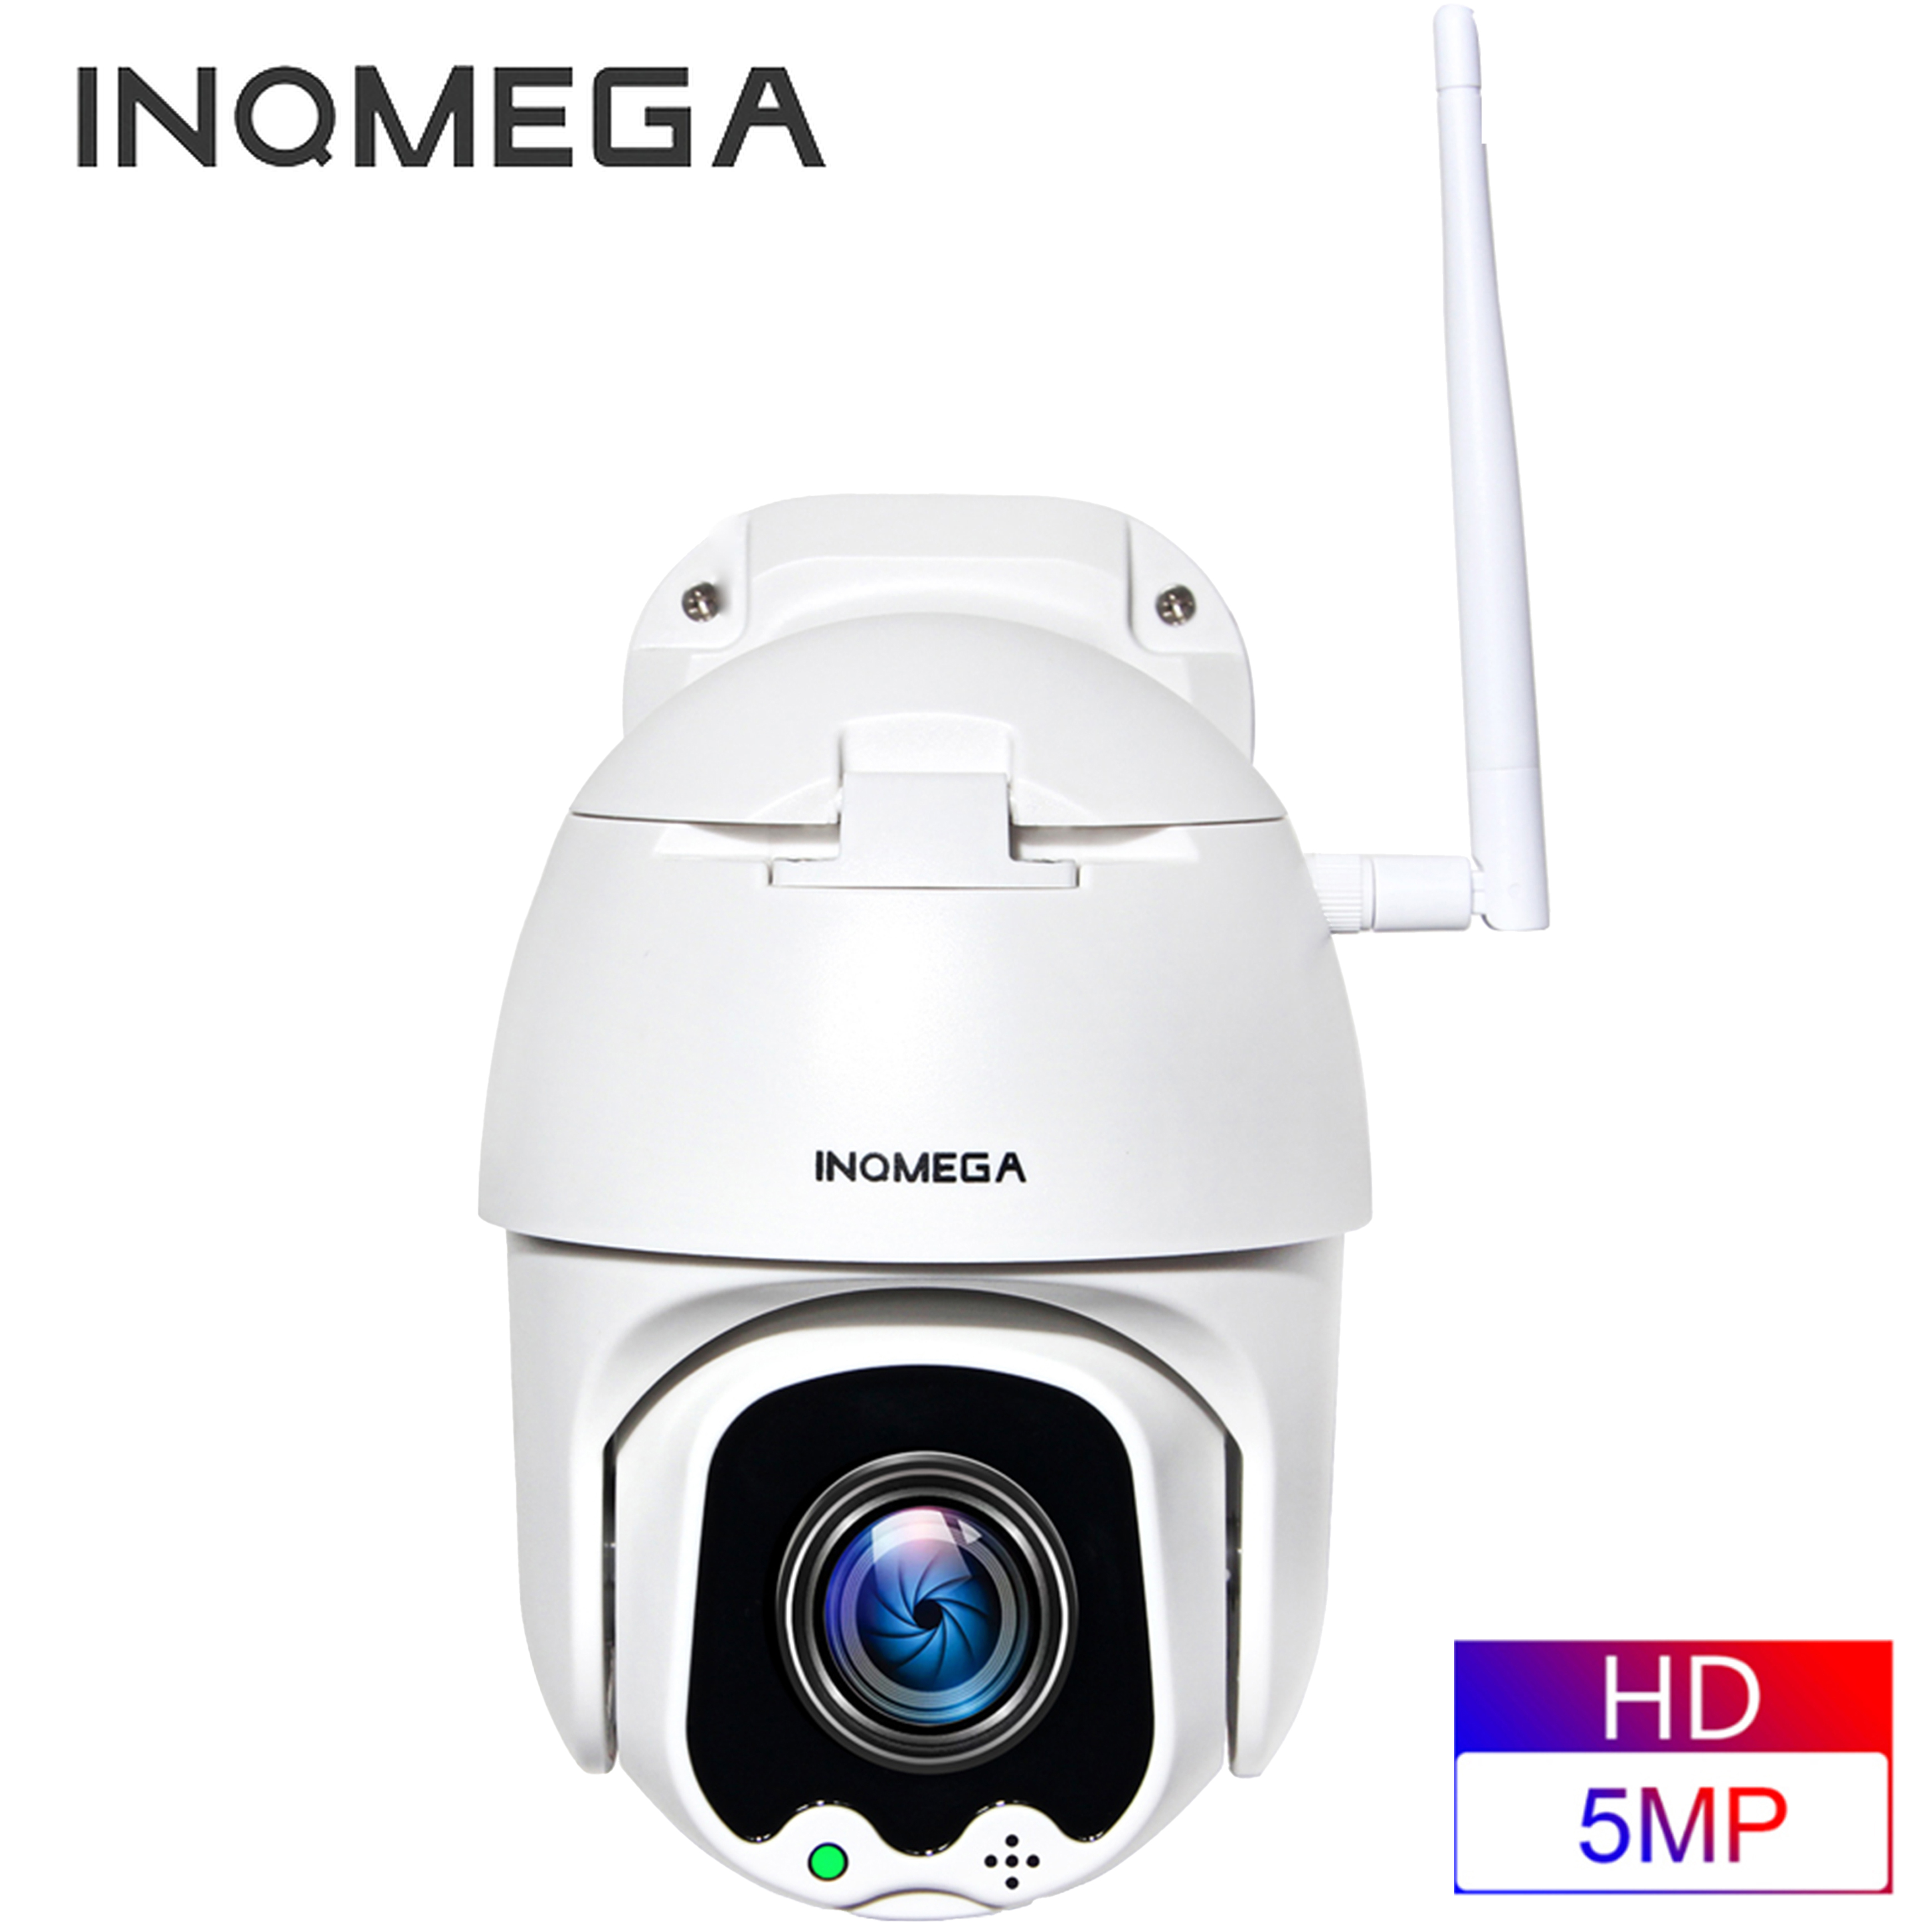 INQMEGA 5MP FHD PTZ Smart Surveillance IP Camera Speed Dome WiFi Wireless 4X Digital ZOOMOutdoor Security Waterproof CCTV Camera